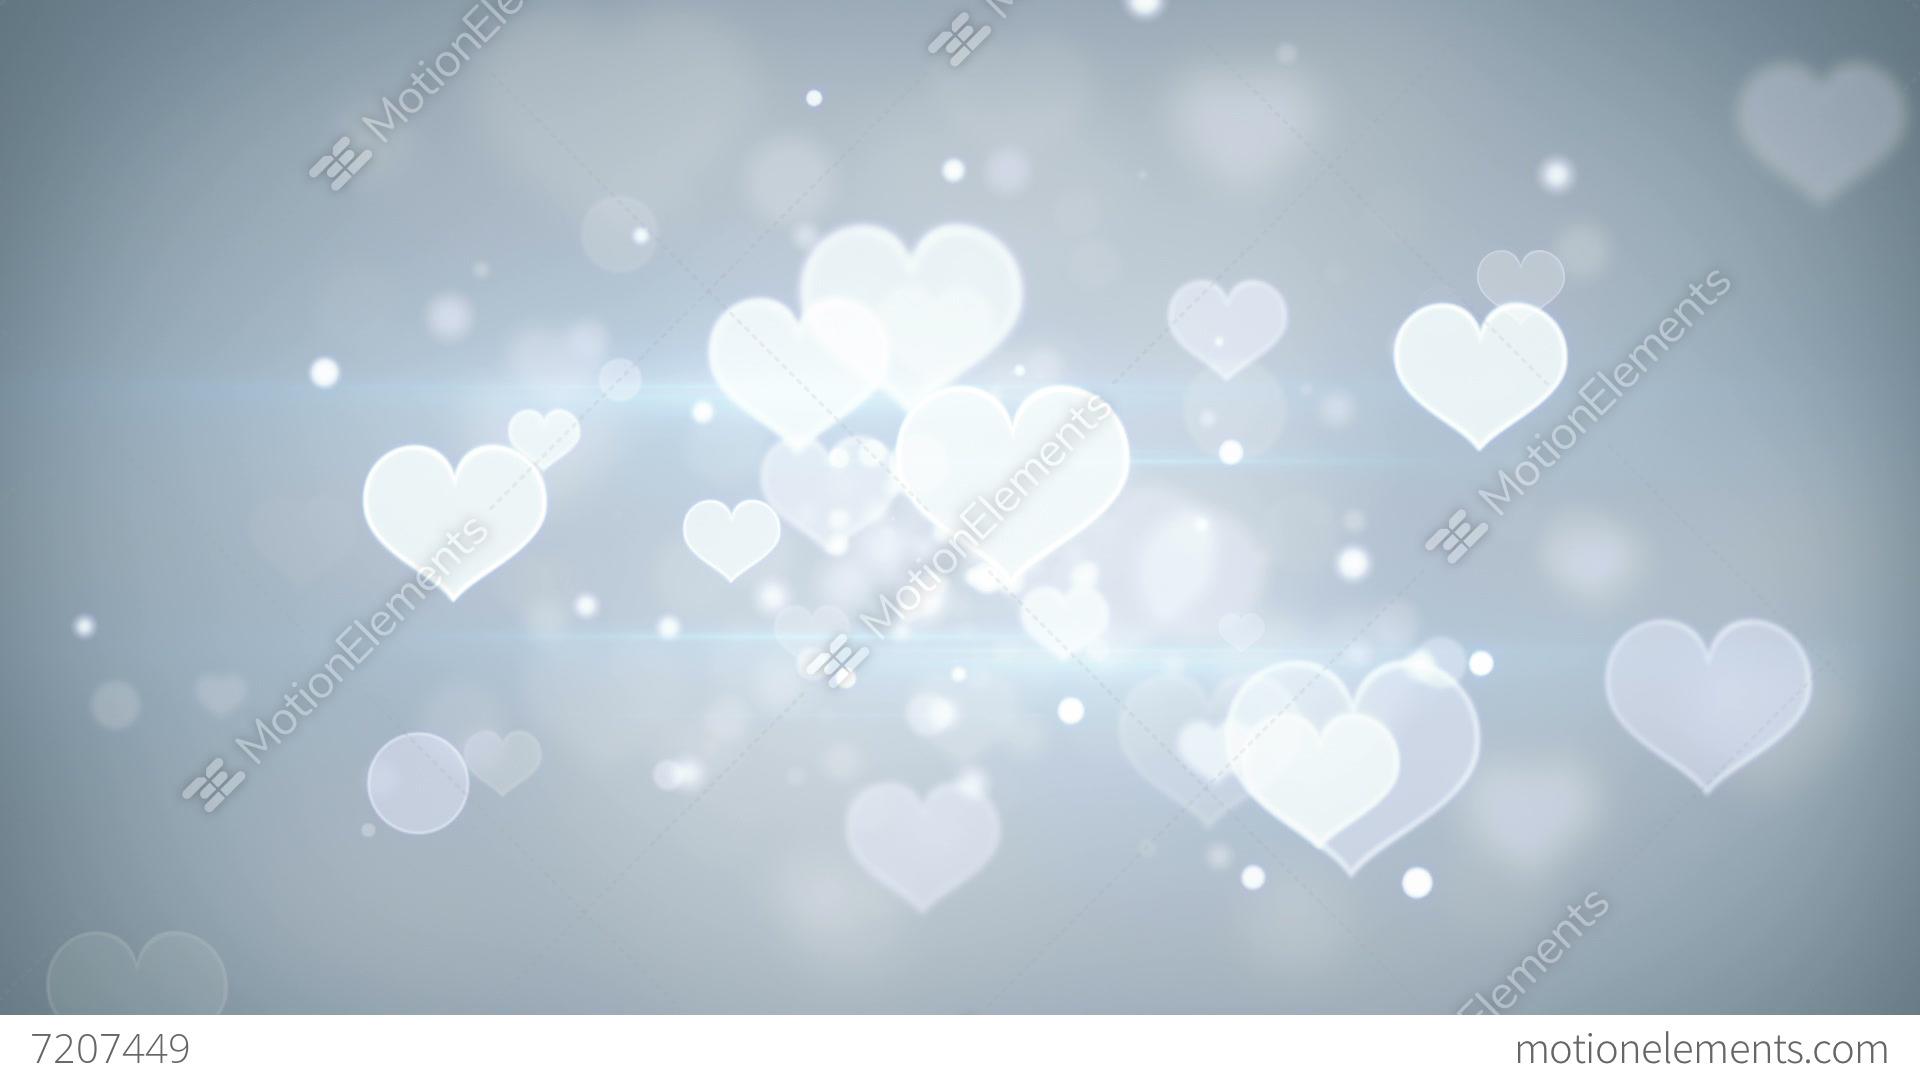 Bokeh Heart Shape Of Light Background Stock Footage Video: Heart Shapes Bokeh Loopable Romantic Background Stock